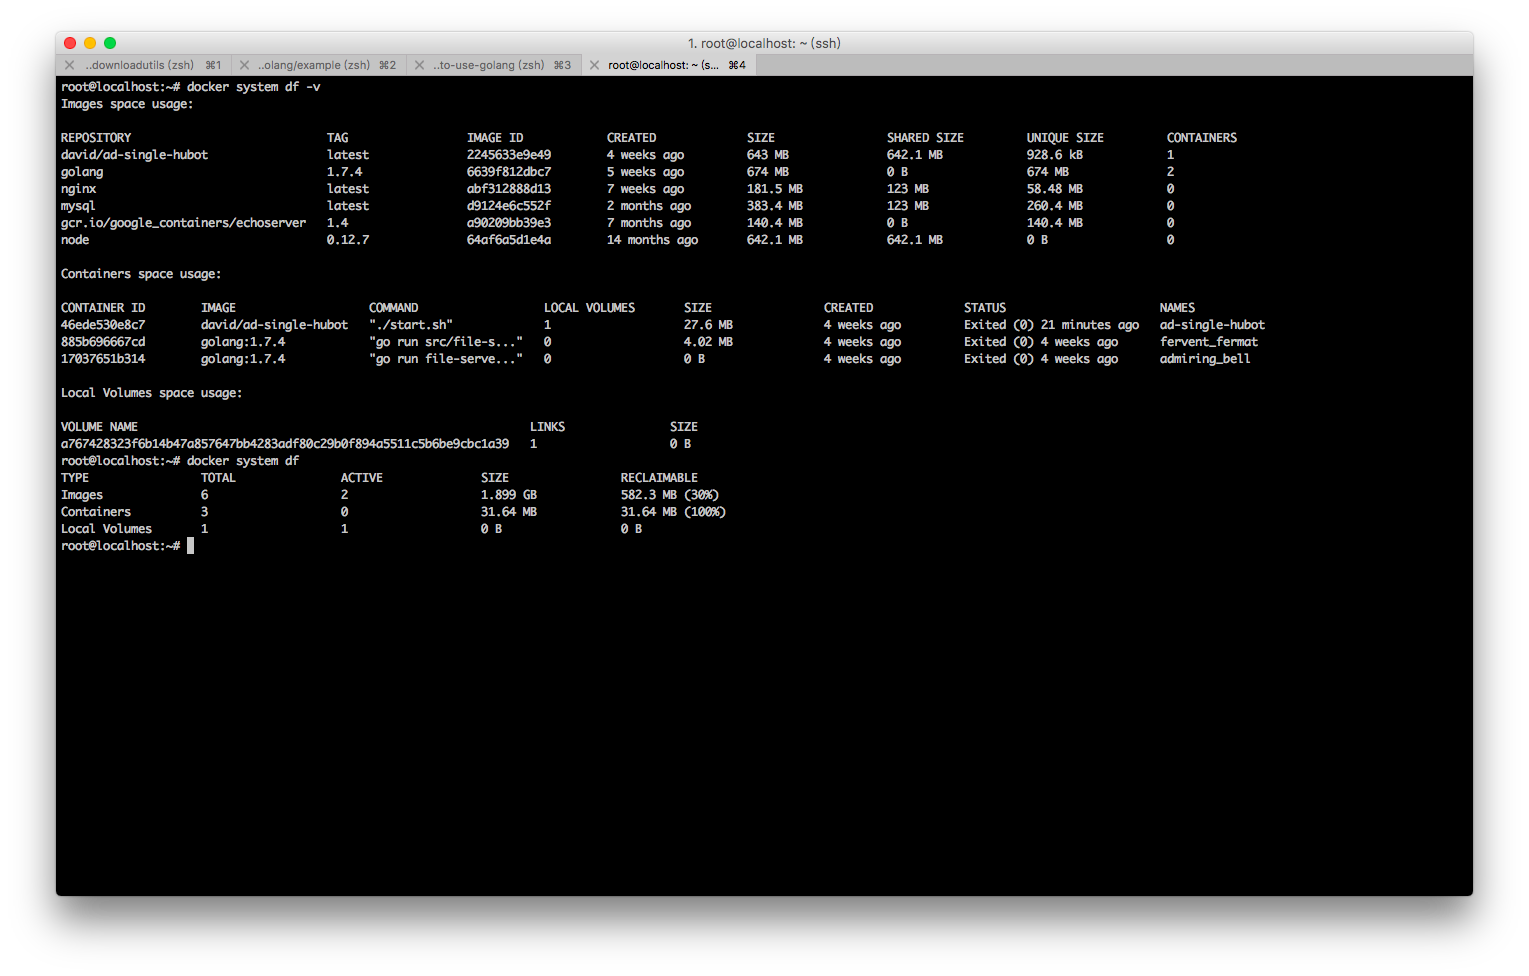 docker 1.13中docker system df的浅析(更新)